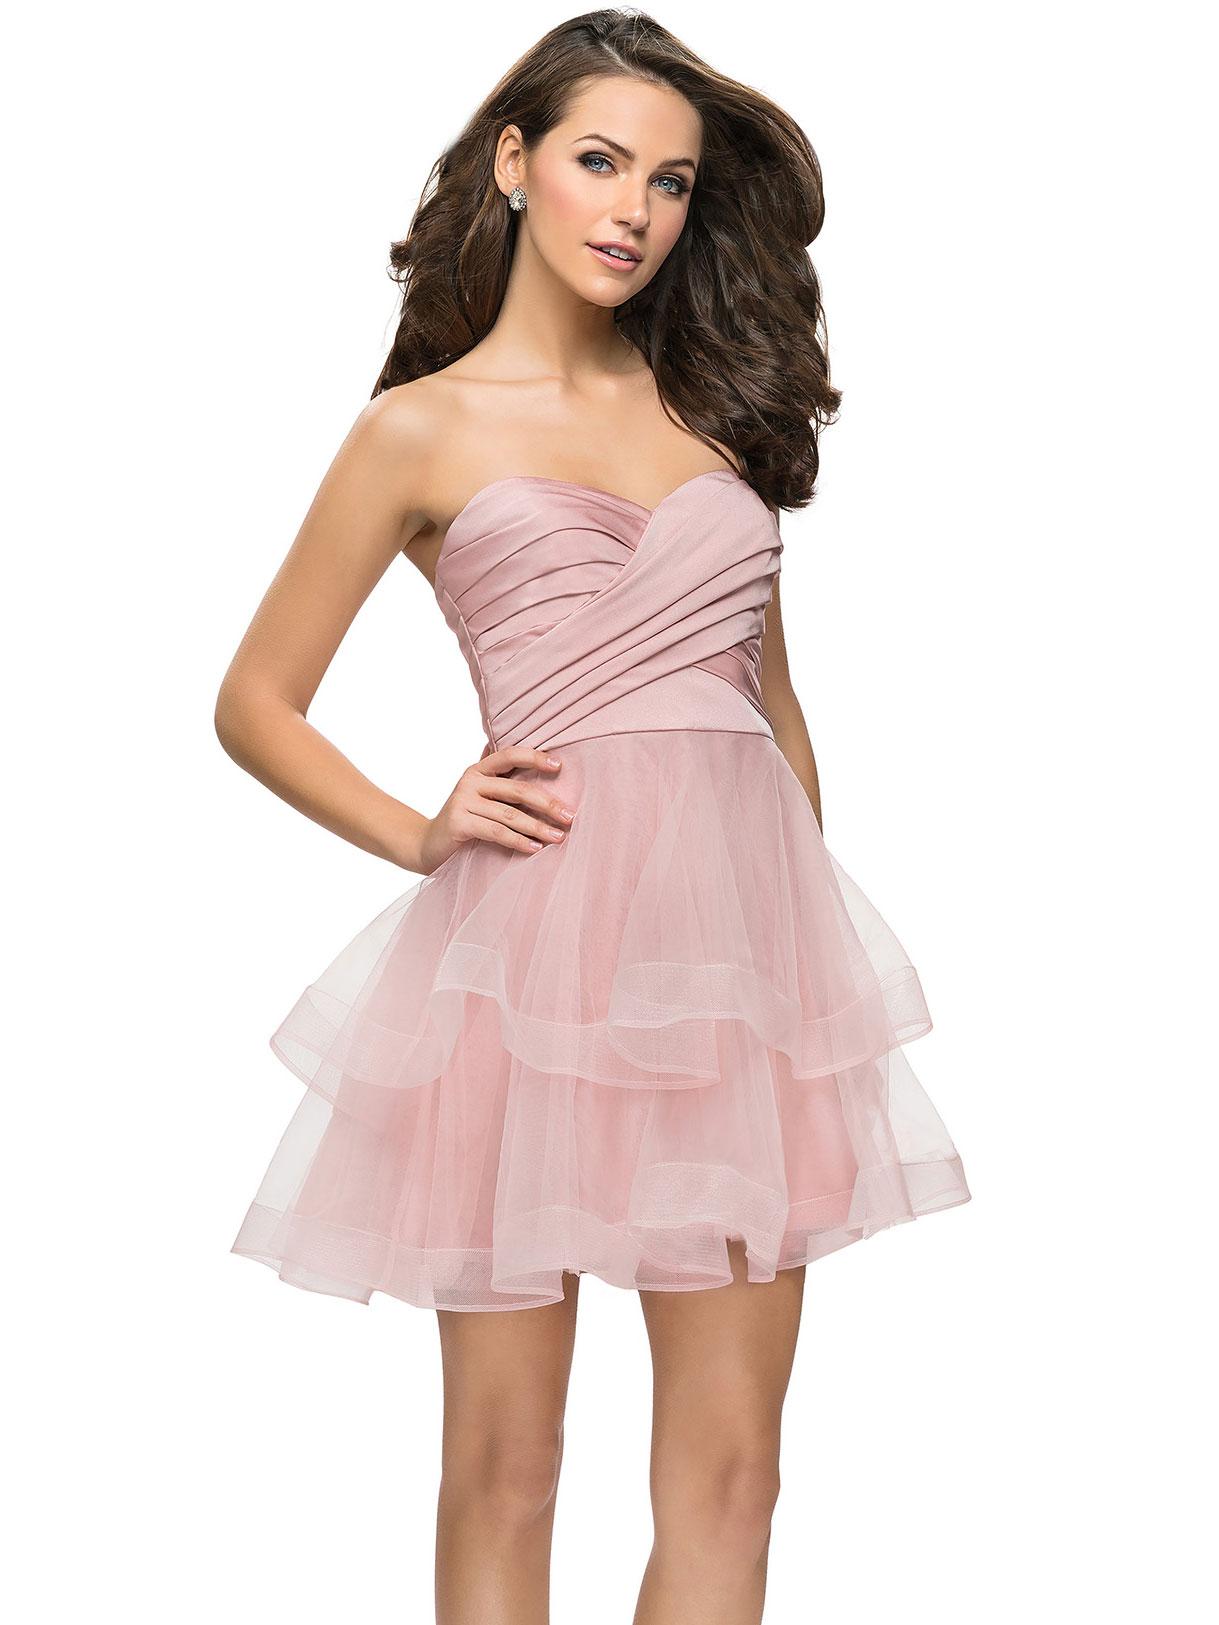 Unique Dresses for Graduation Parties - PromHeadquarters